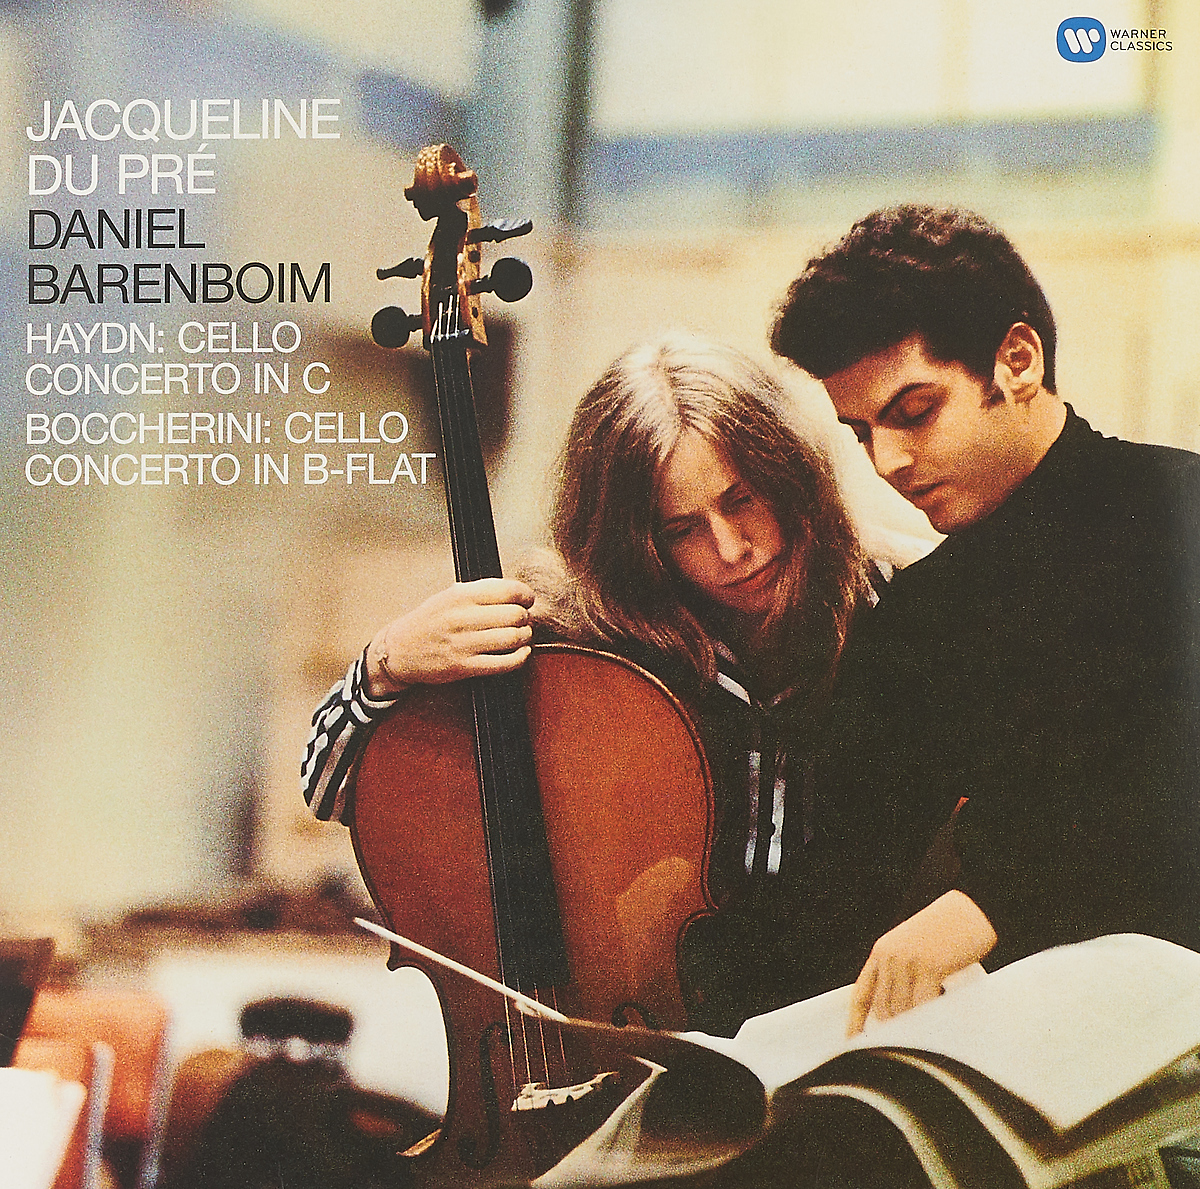 Haydn Wood,Луиджи Боккерини Haydn, Boccherini. Cello Concerto In C/B-Flat (LP) haydn haydnjacqueline du pre cello concerto in c boccherini cello concerto